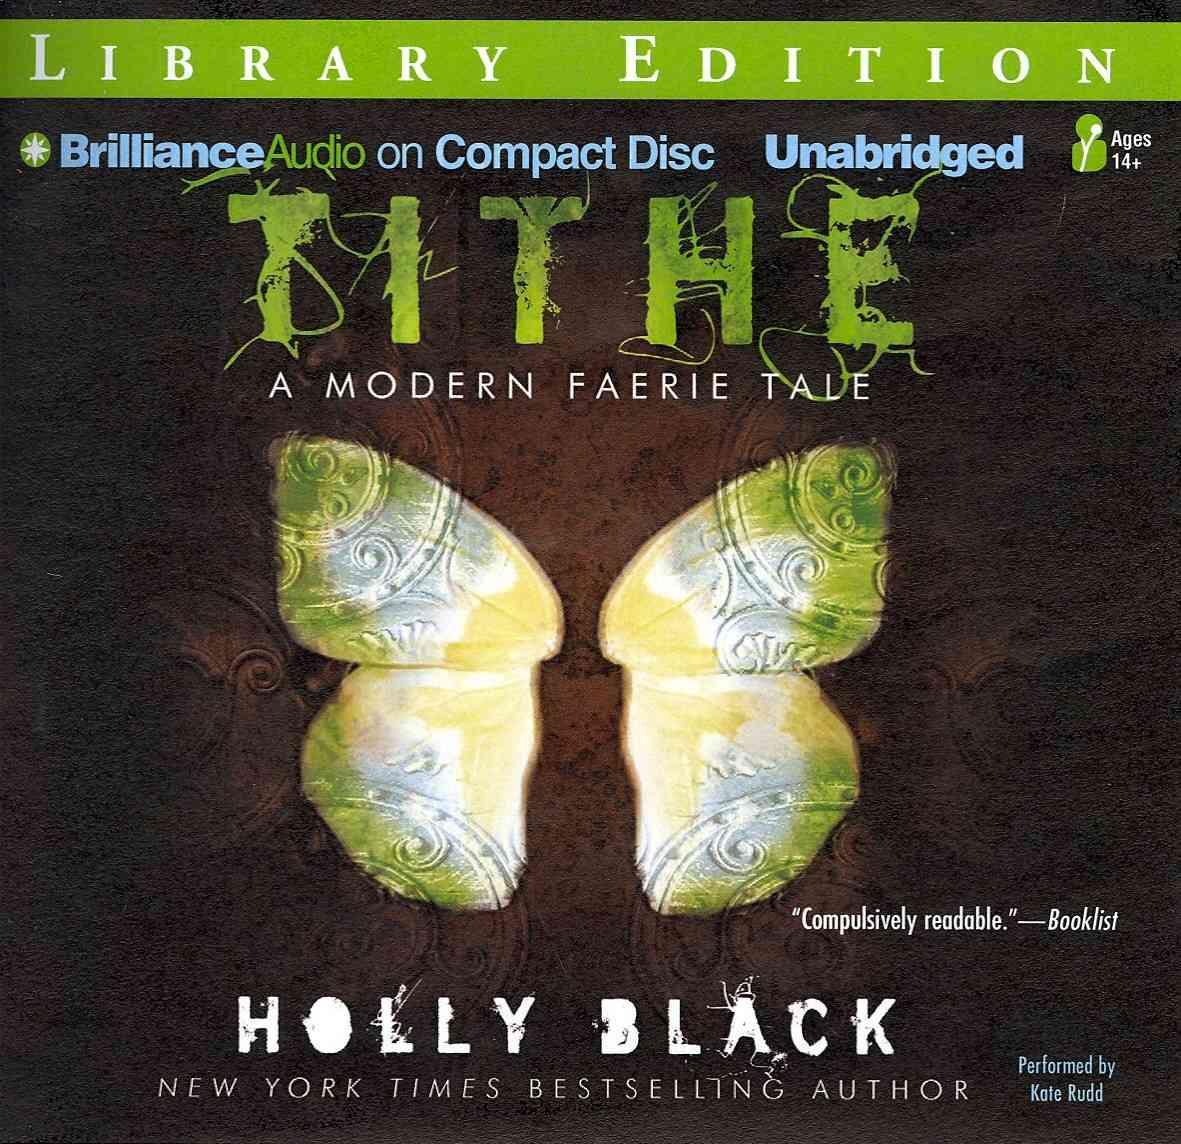 Tithe: A Modern Faerie Tale, Library Edition (CD-Audio)